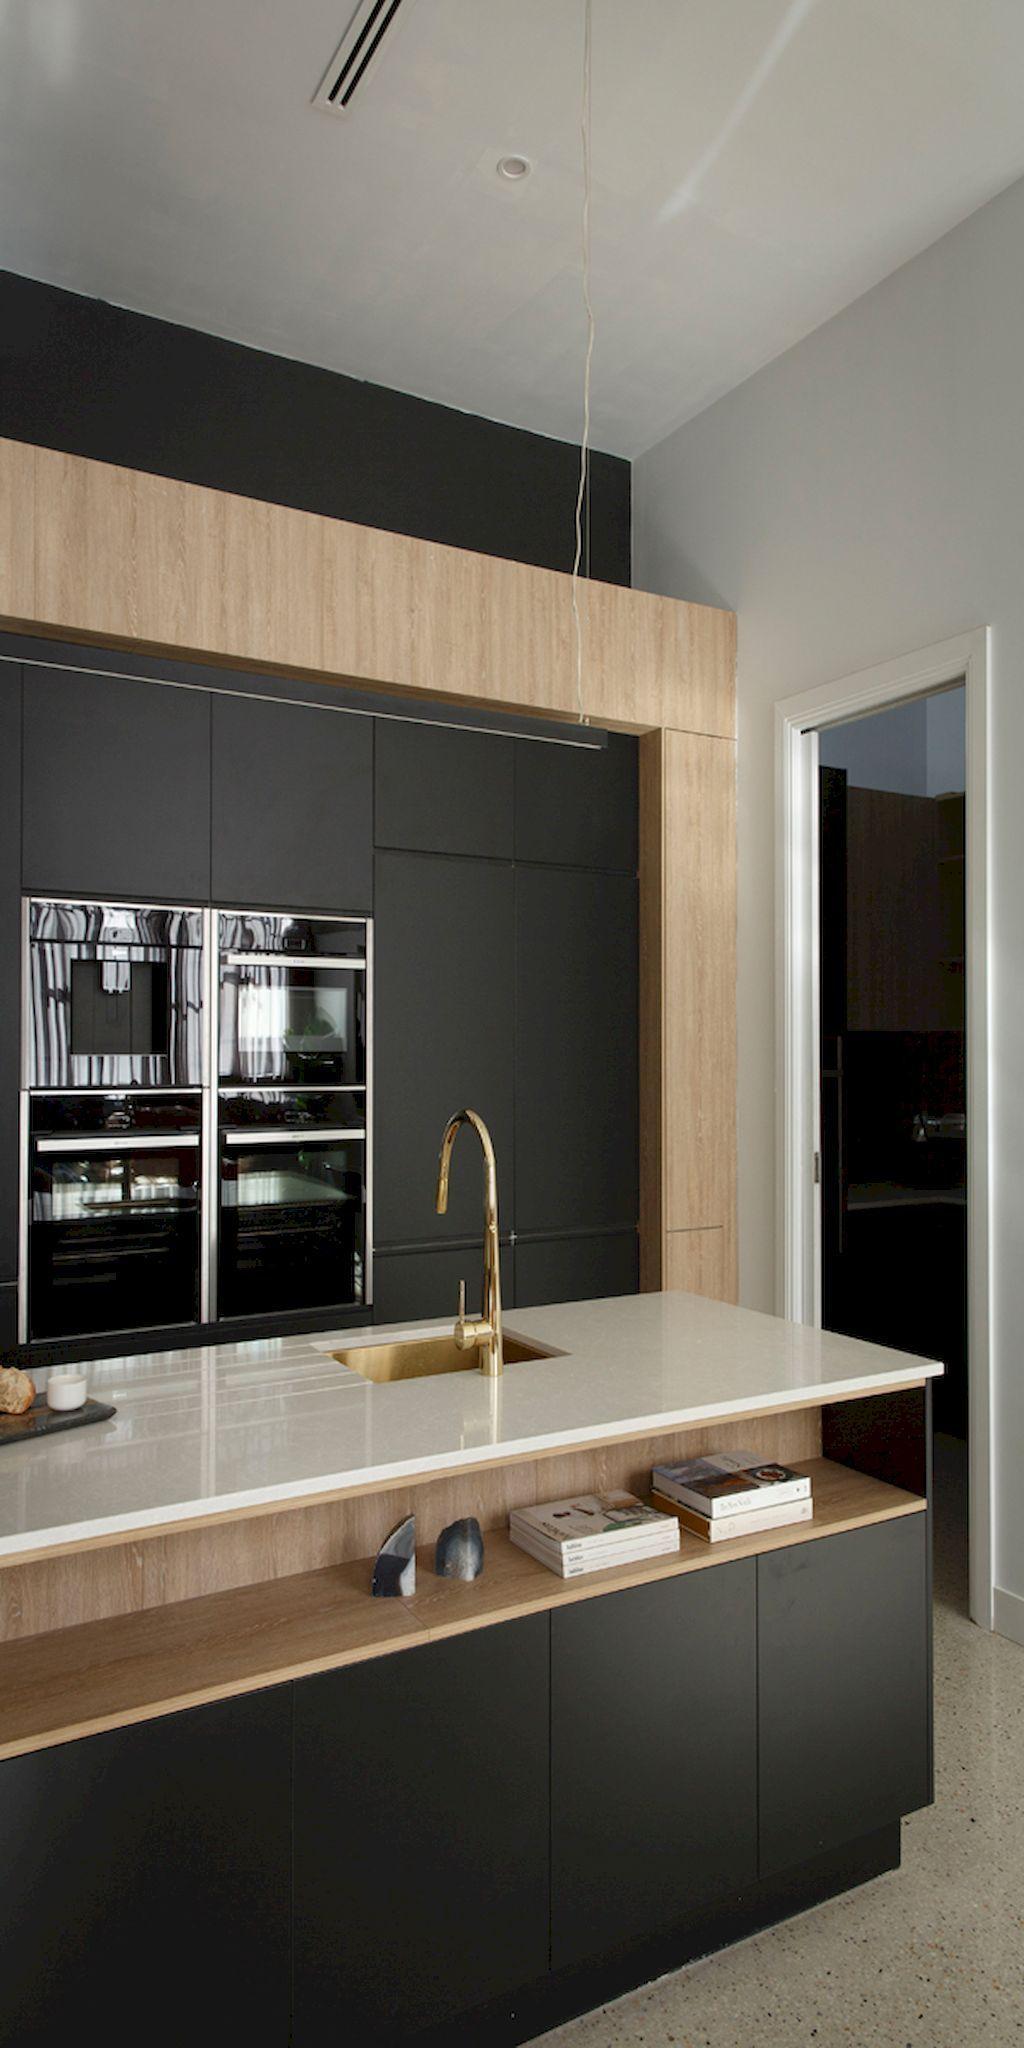 Pin by lorena remon on cocinas pinterest kitchen kitchen design